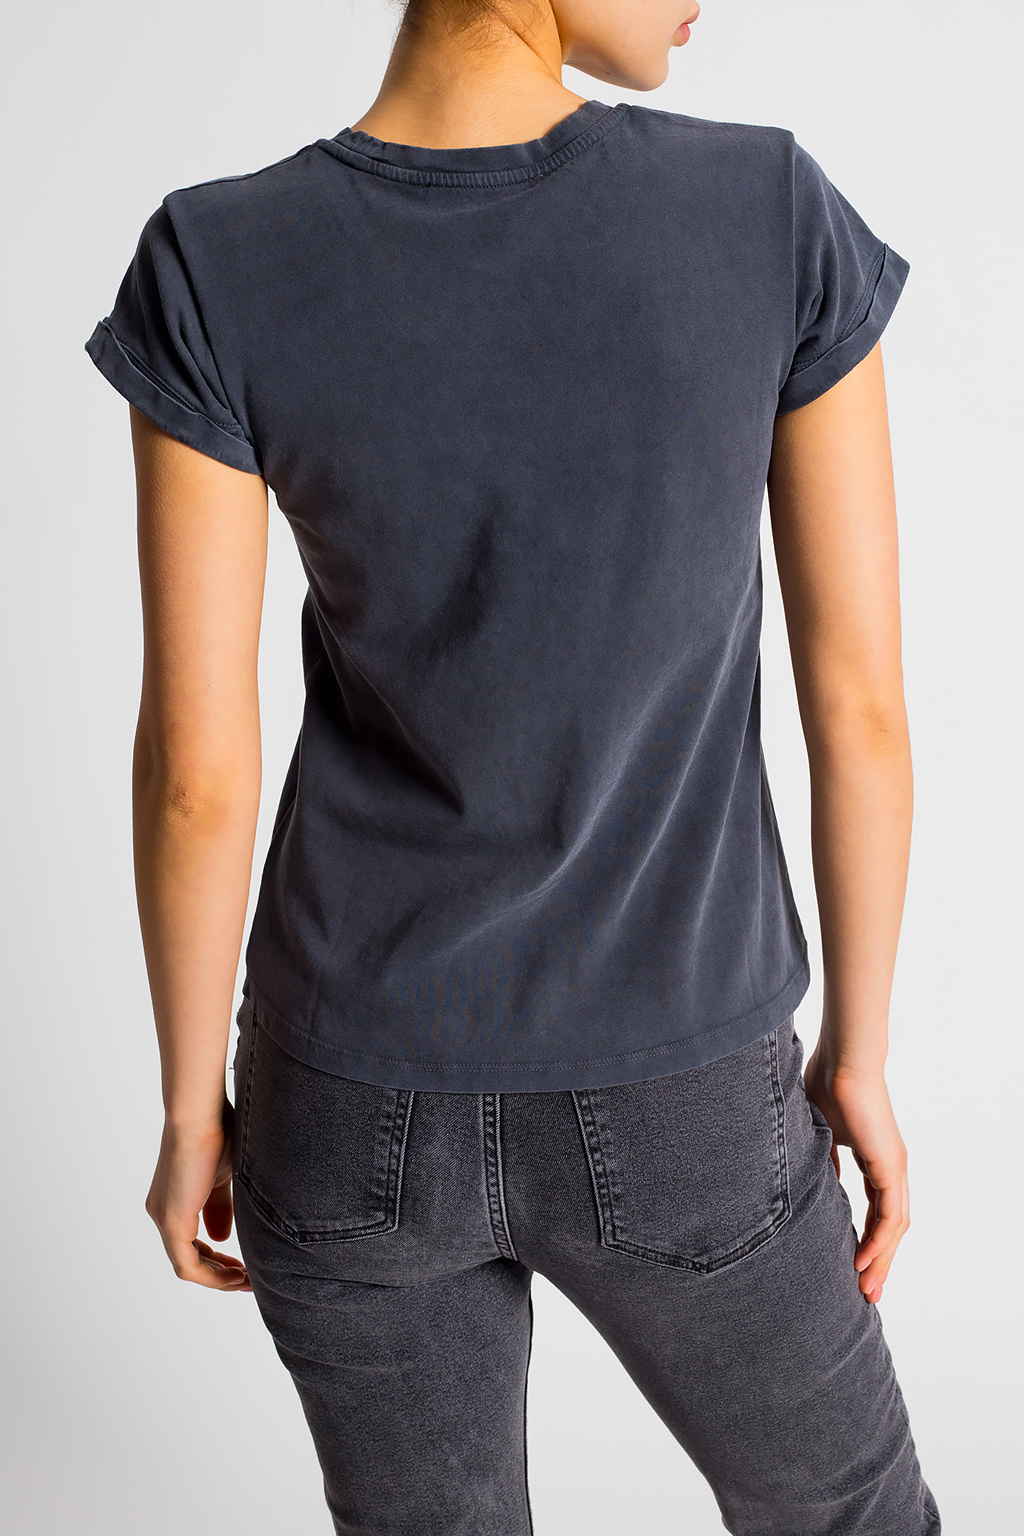 AllSaints 'Livo Anna' T-shirt